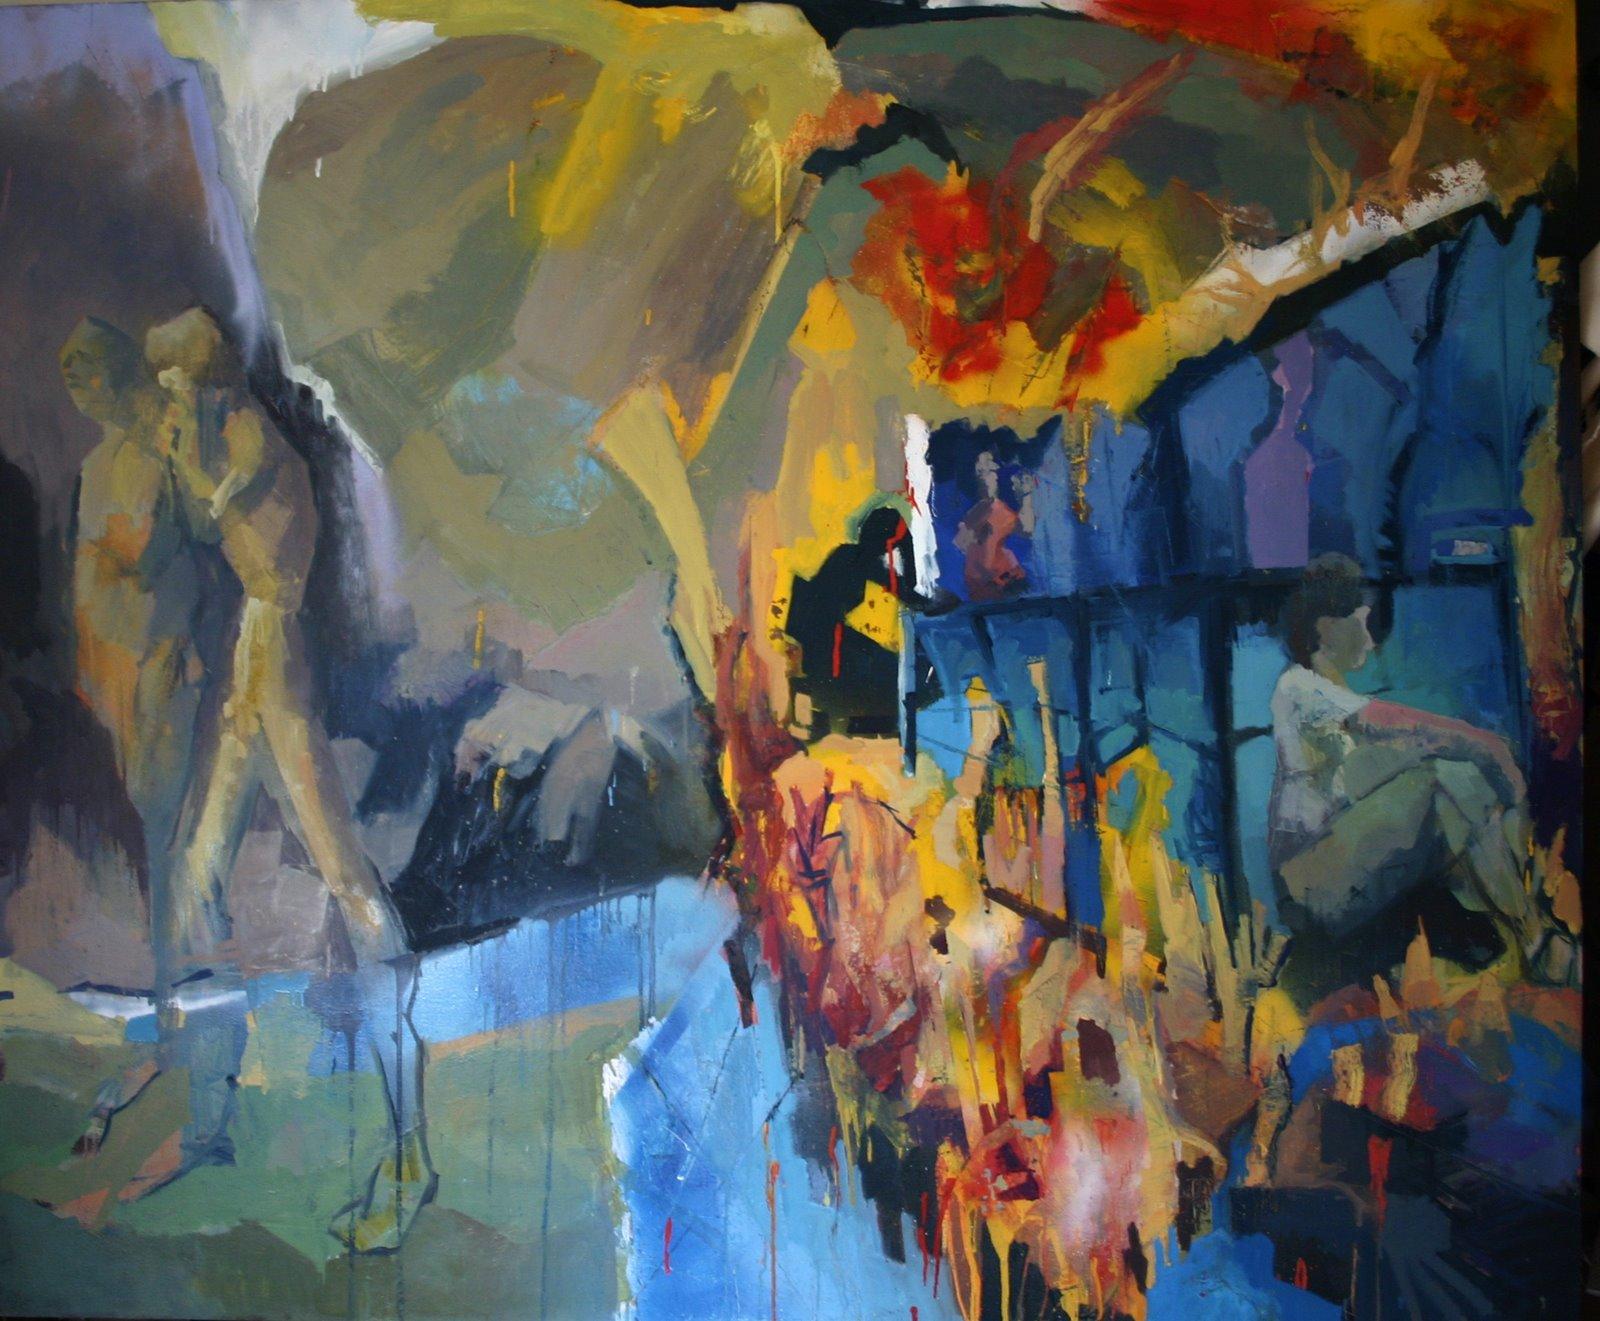 [Expulsion+2009+Oil+on+Canvas+60]